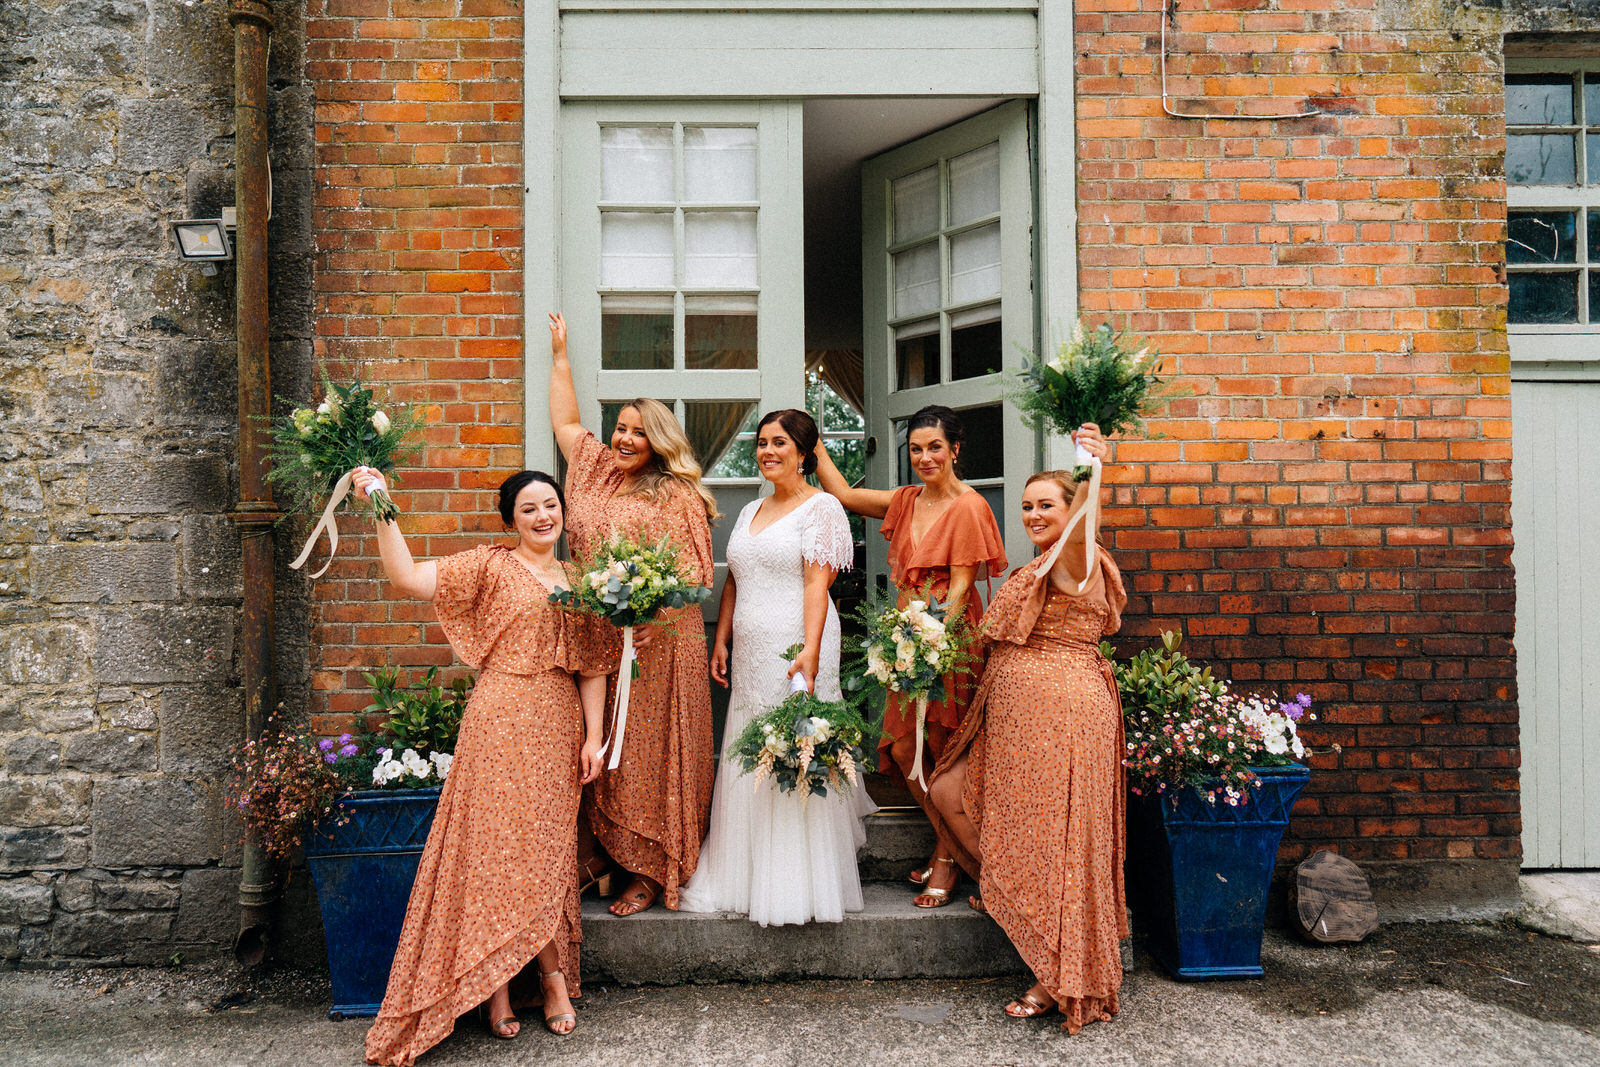 wedding photographer dublin 1,028 151